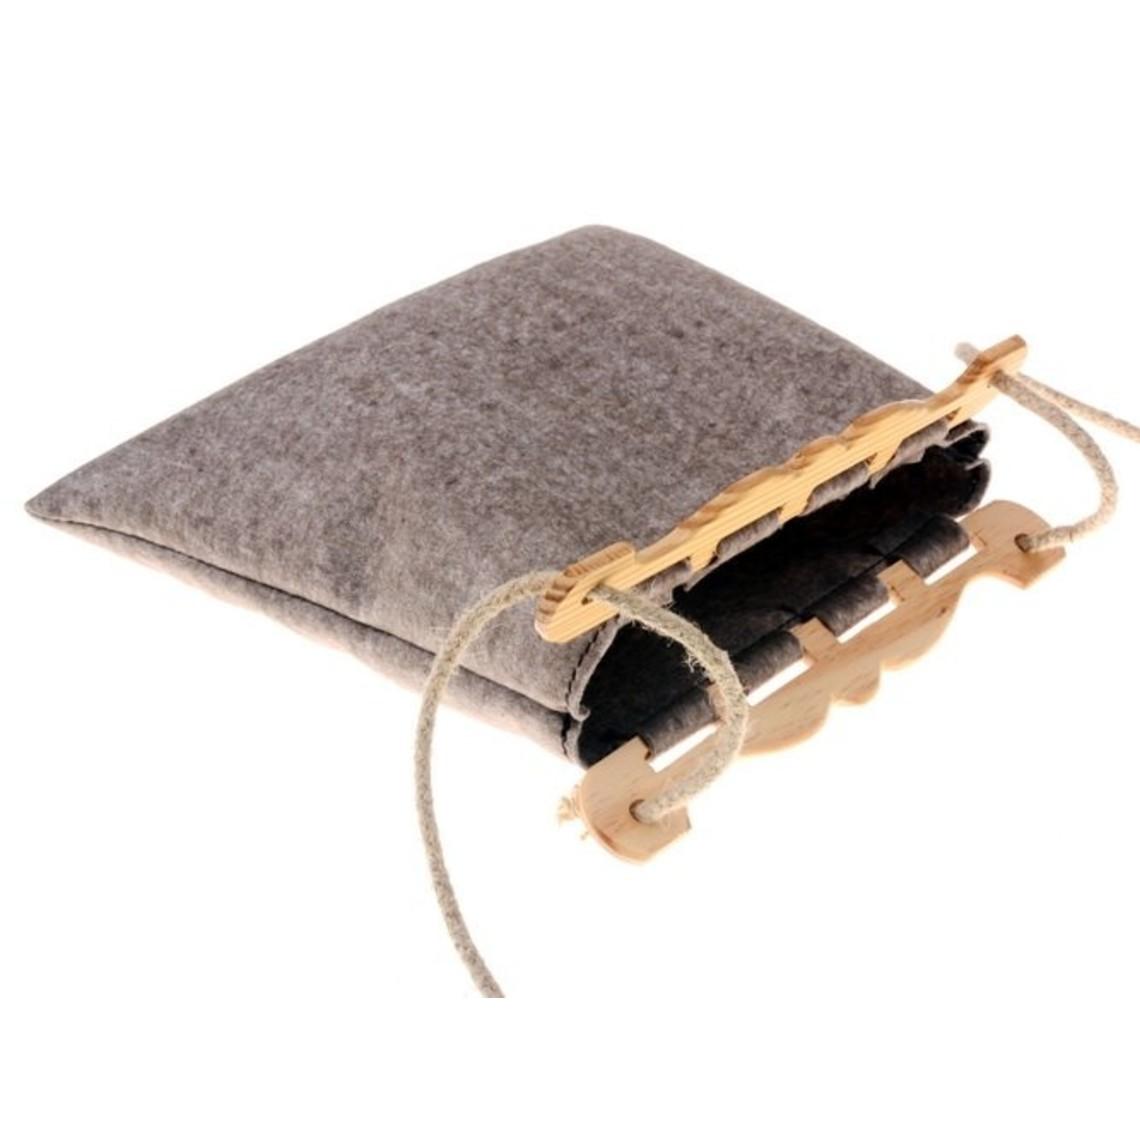 Haithabu vichingo piccola borsa